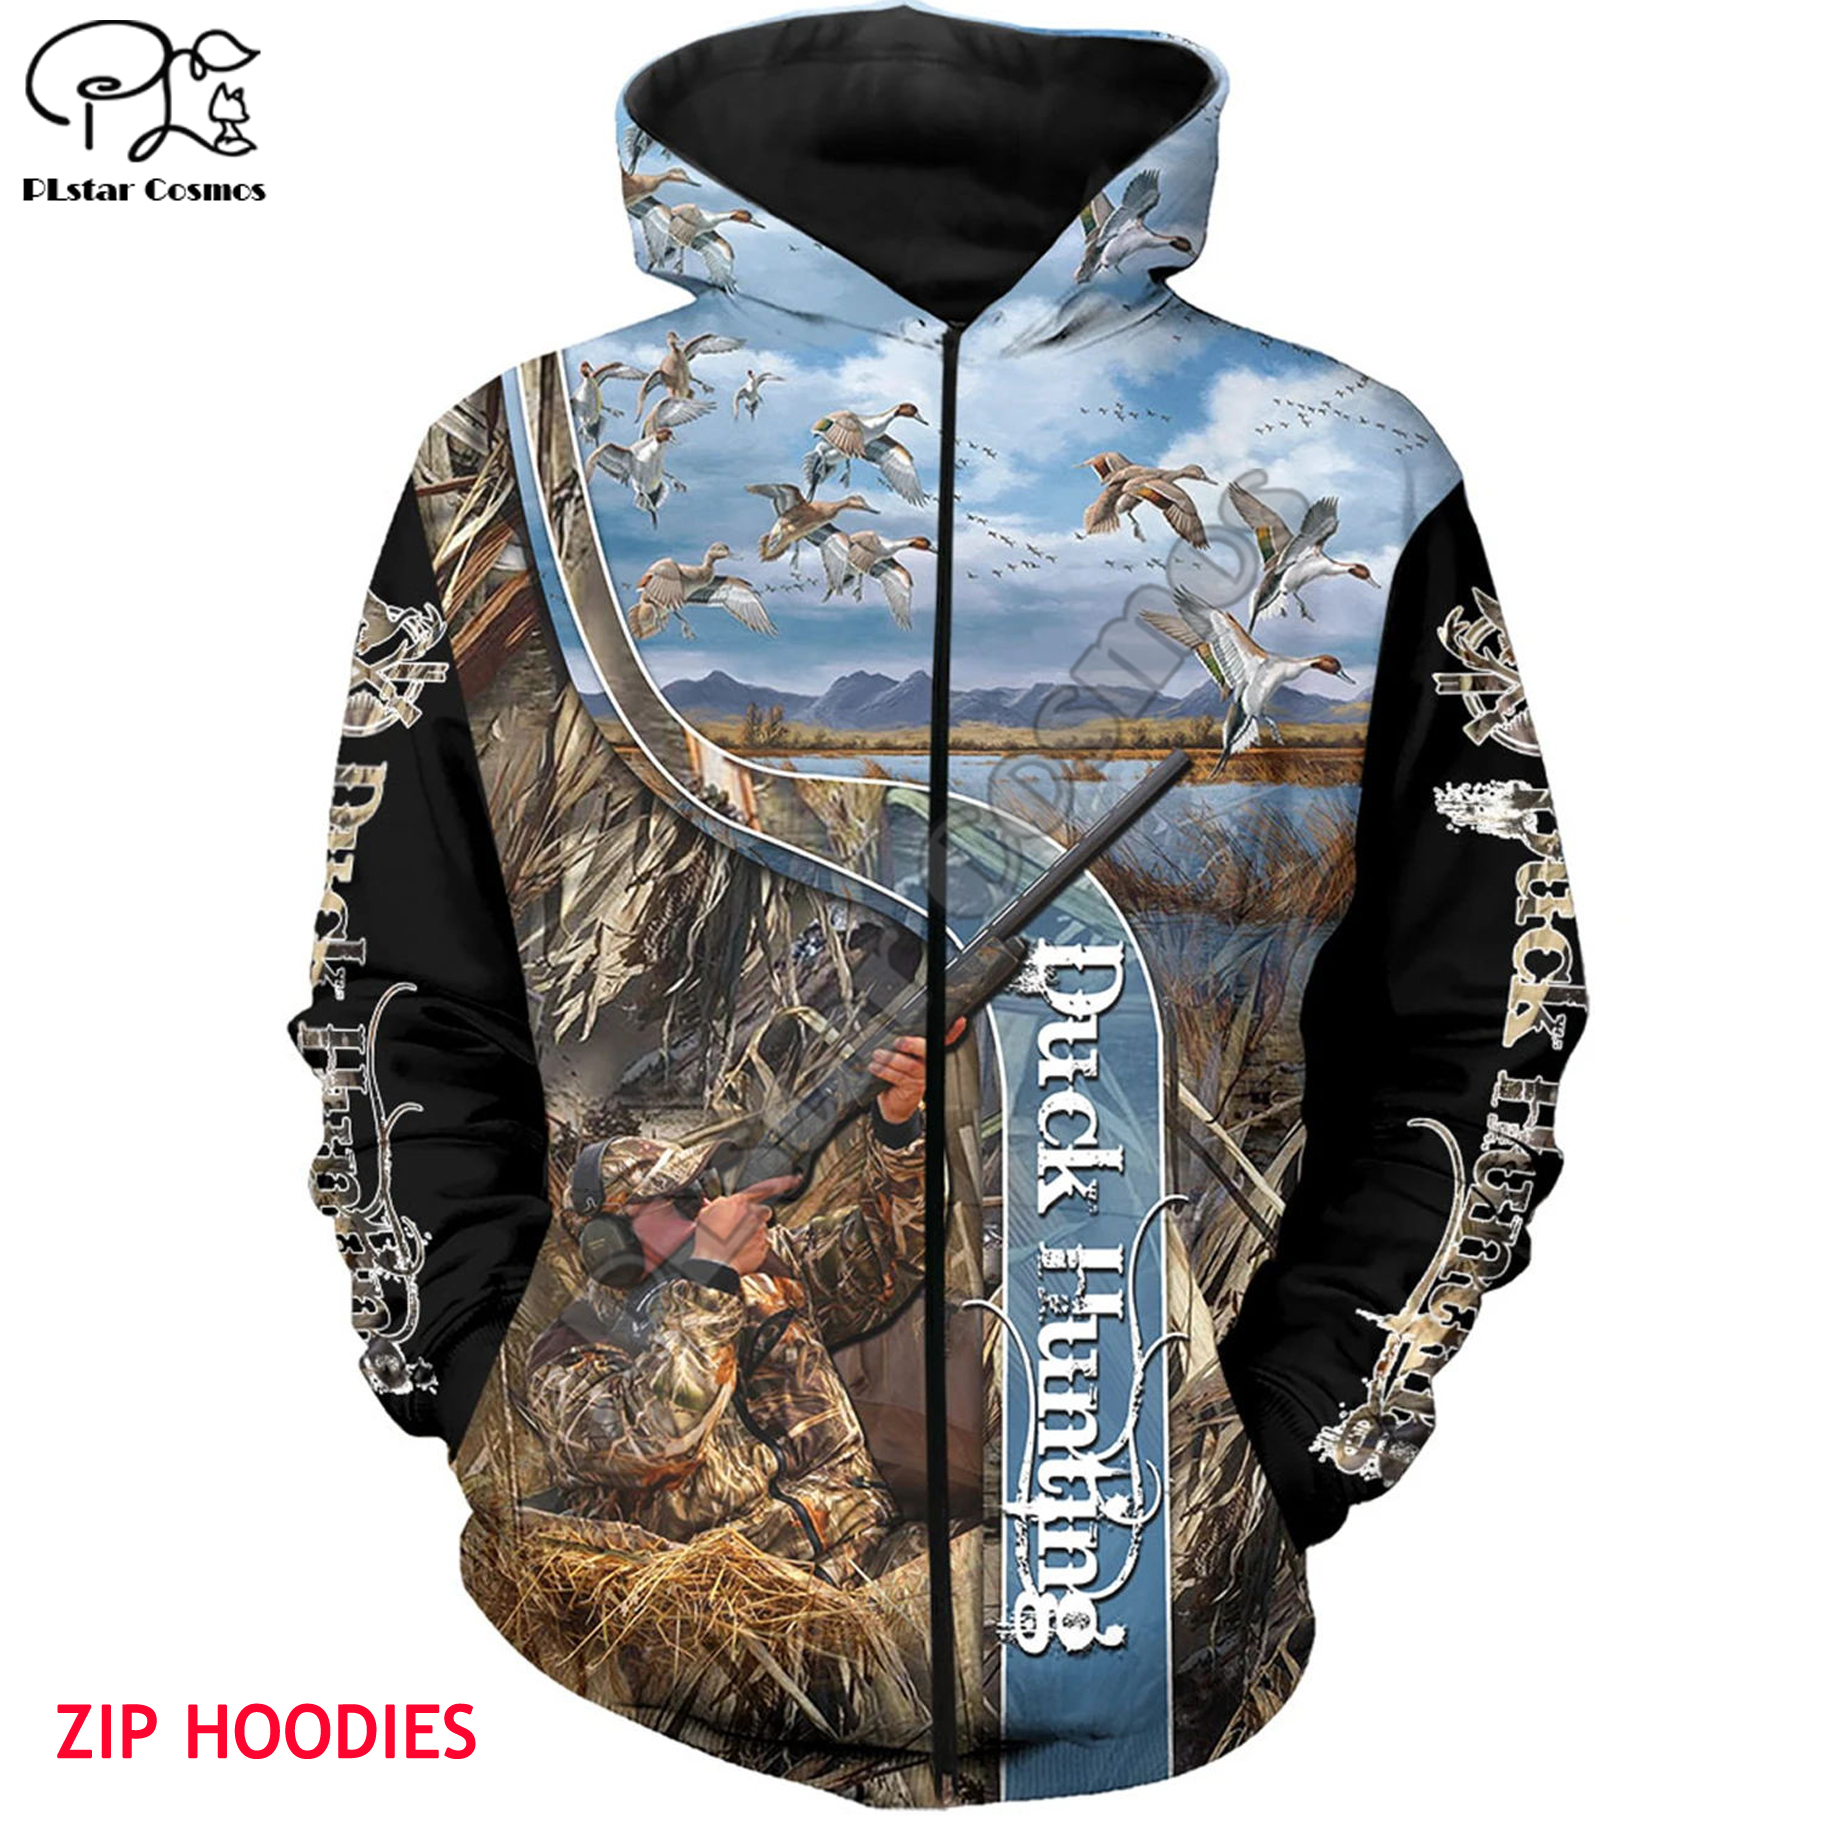 Duck Hunting 3d All Over Printed Unisex Hoodies Harajuku Fashion Casual Hooded Sweatshirt Zip Hoodies